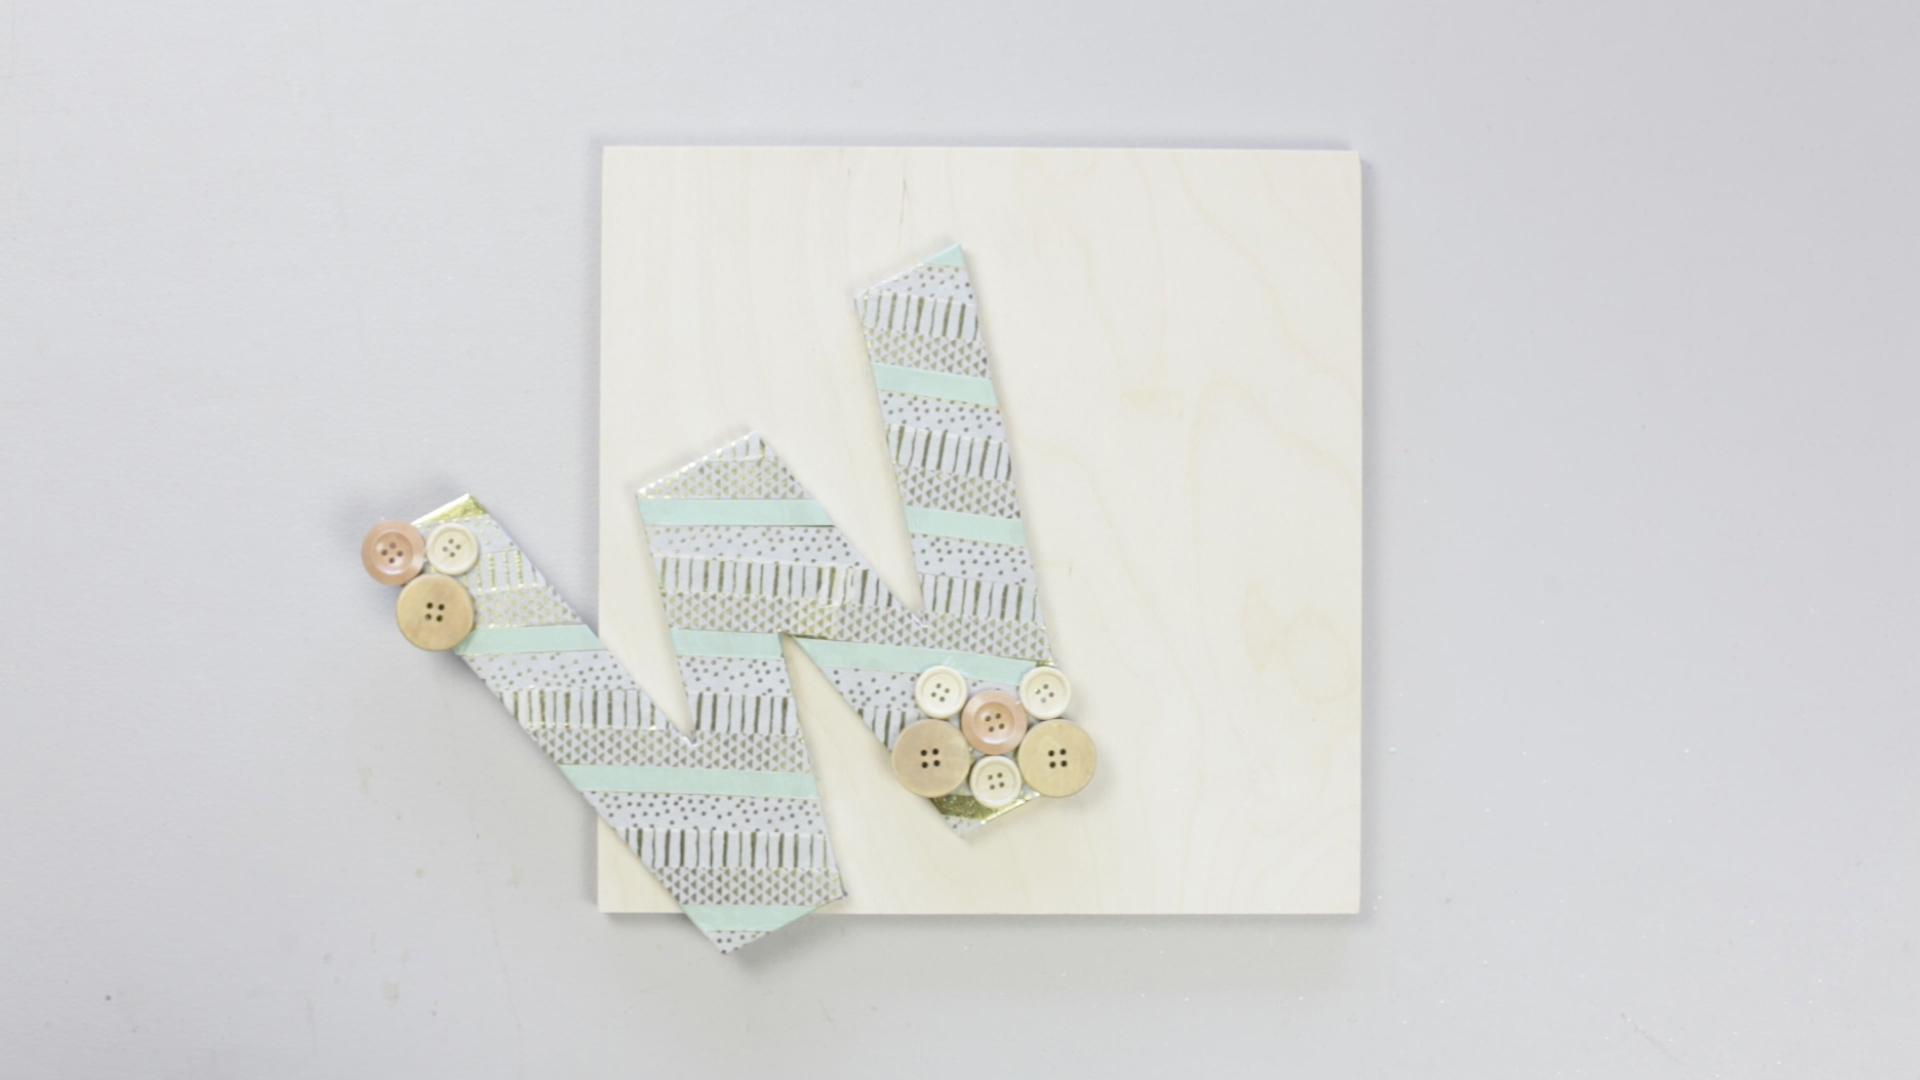 diy-washi-tape-monogram-letter-mount-wood